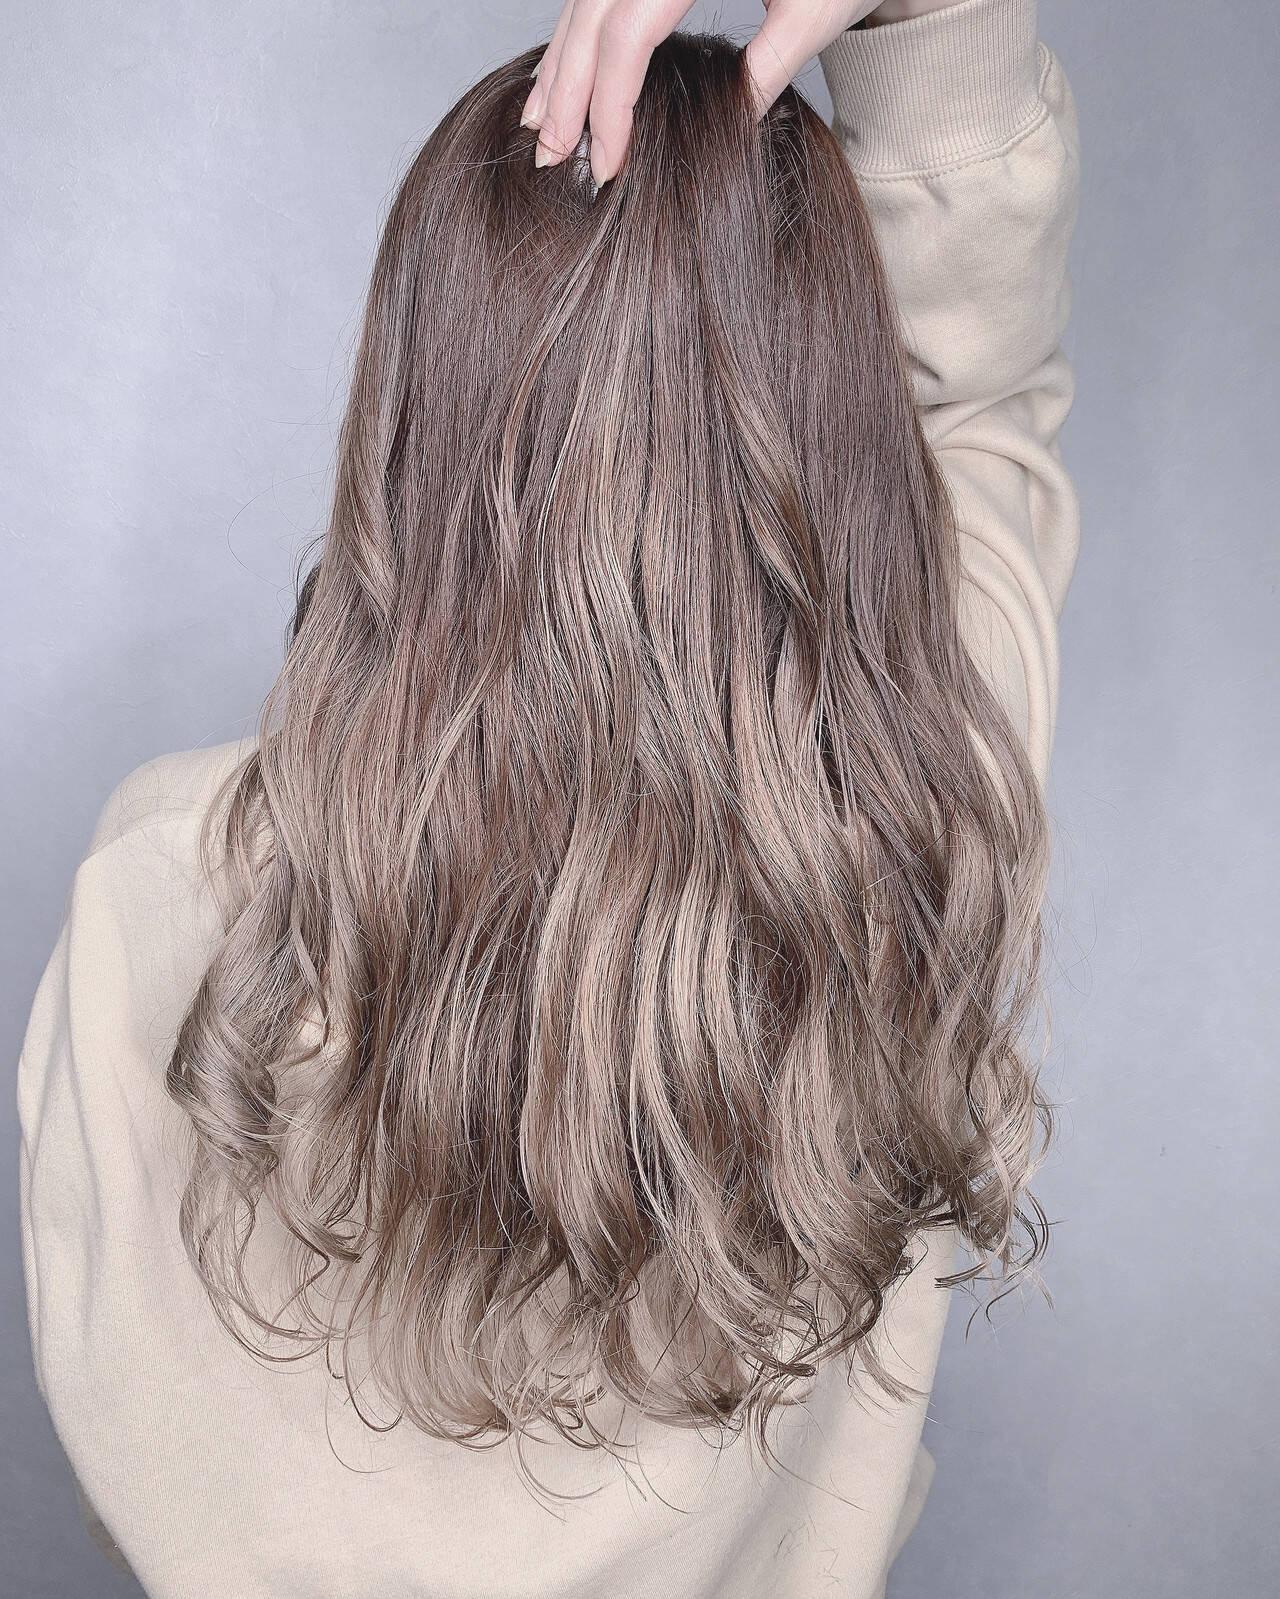 3Dハイライト ロング グラデーションカラー 透明感カラーヘアスタイルや髪型の写真・画像